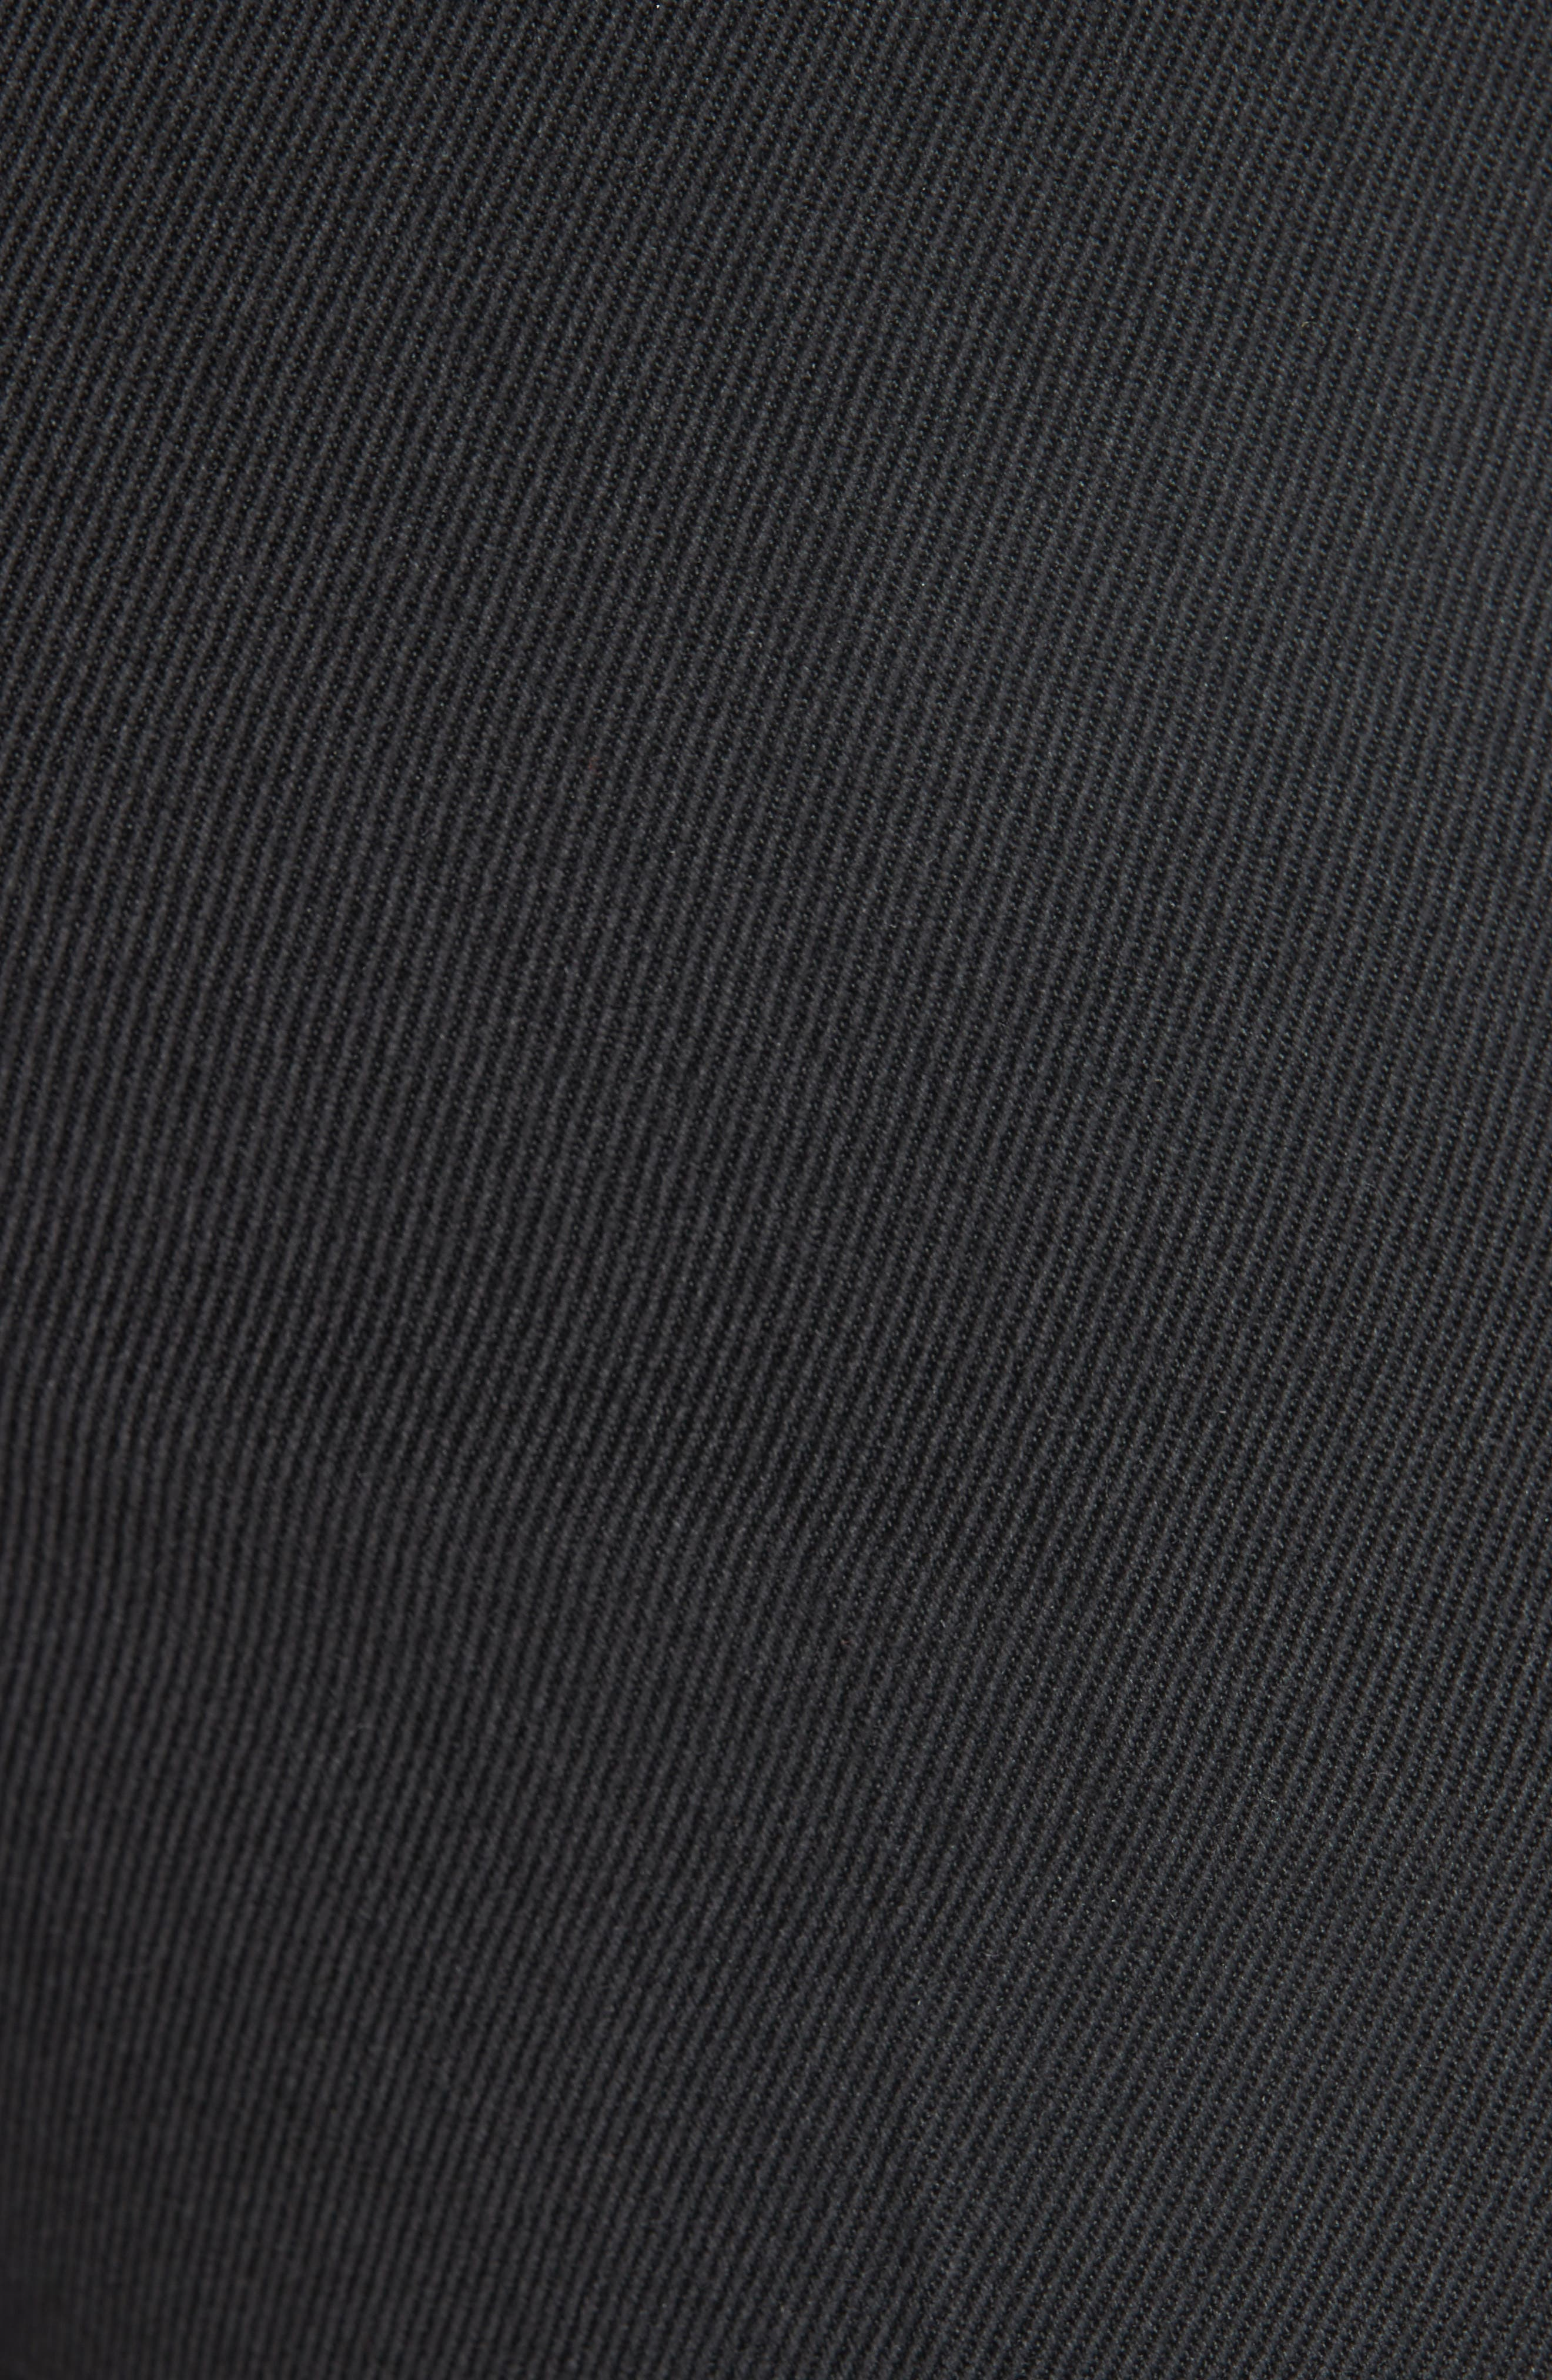 CALVIN KLEIN 205W39NYC,                             Uniform Stripe Trousers,                             Alternate thumbnail 5, color,                             060